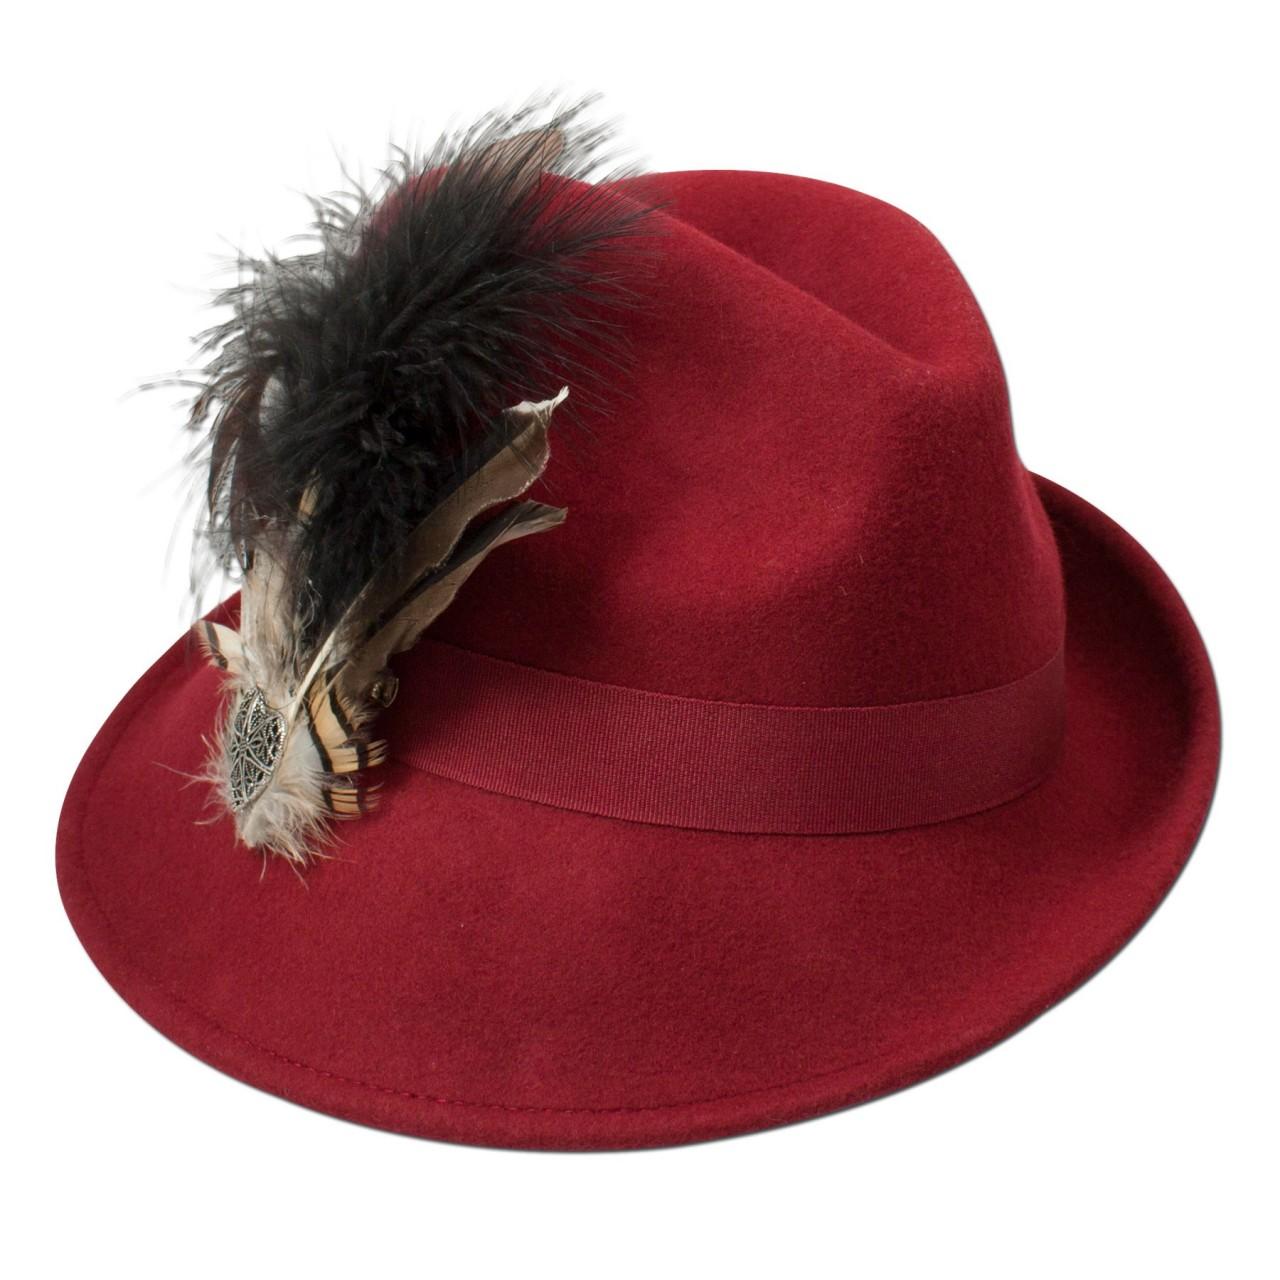 Filz-Trachtenhut Otilia rot